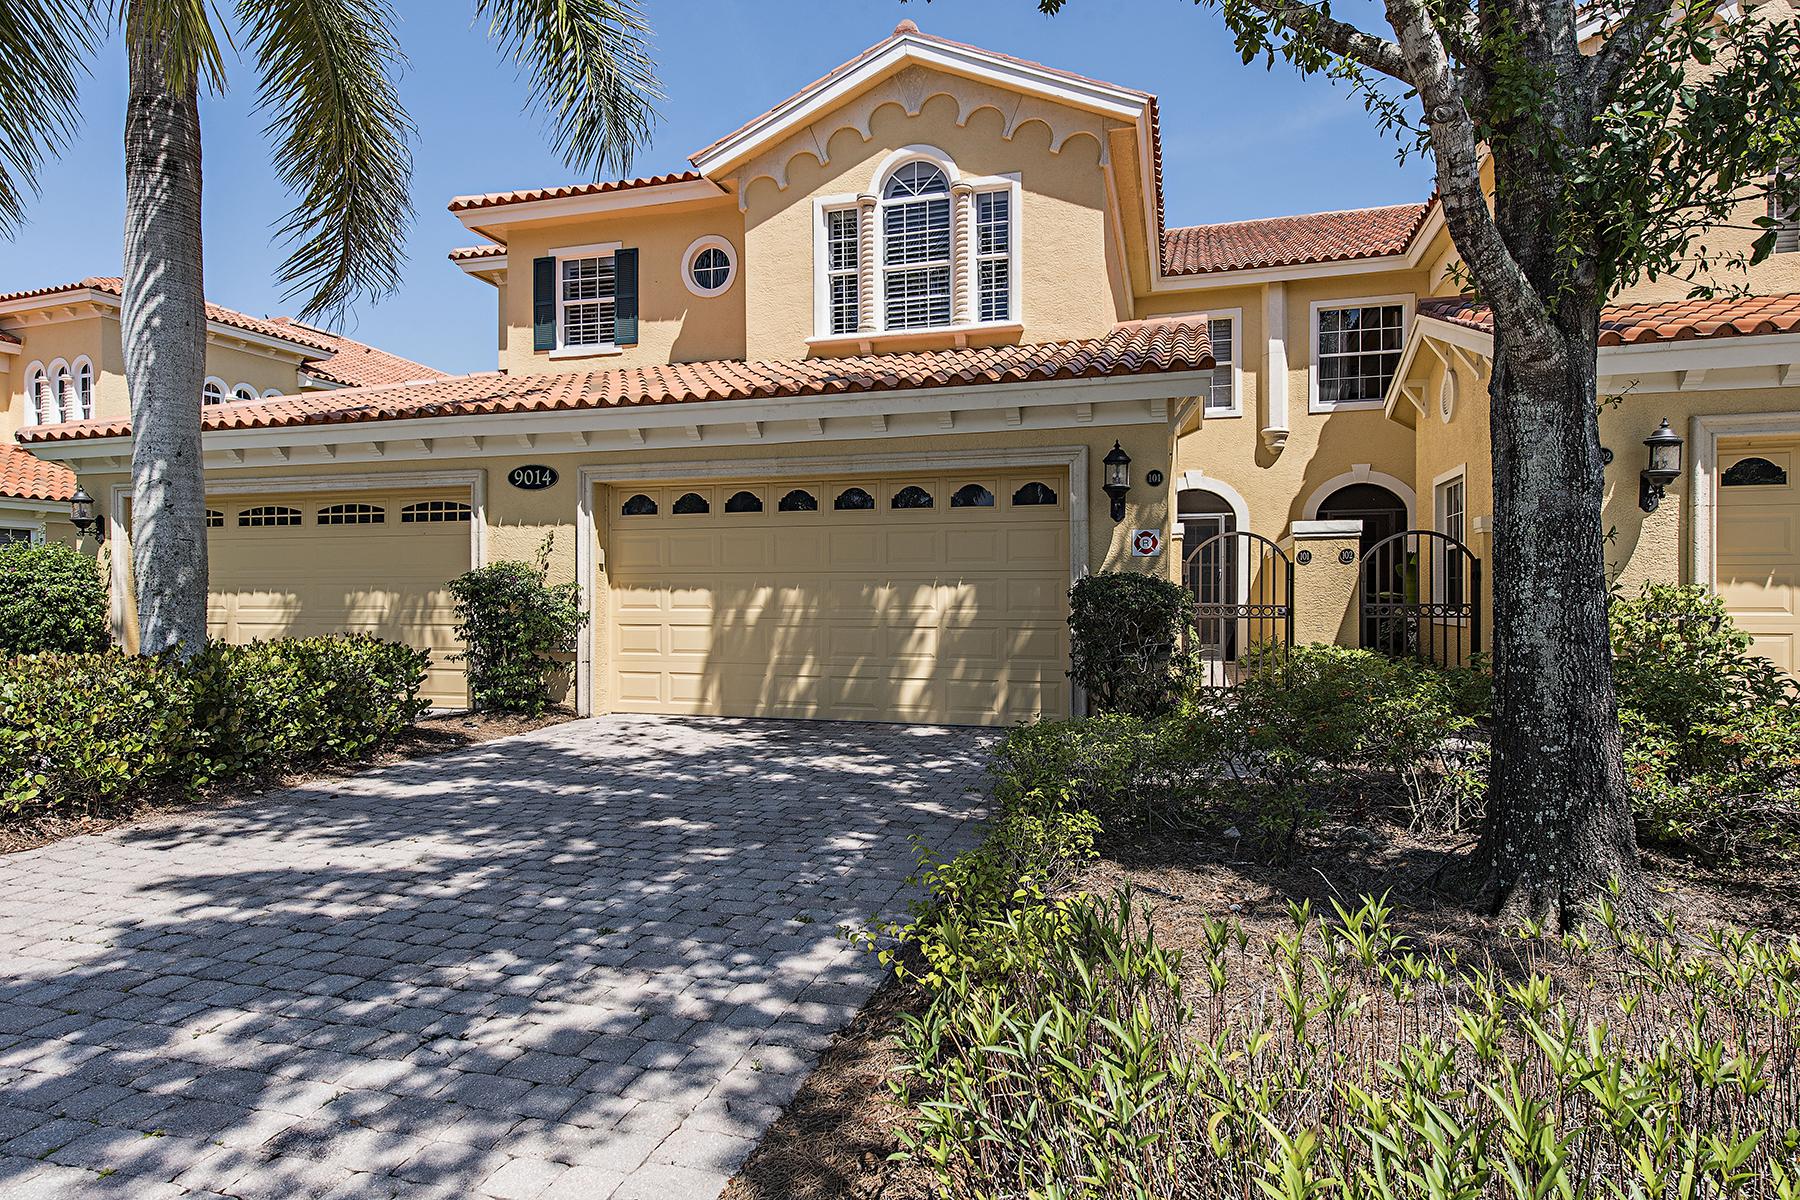 Condominium for Sale at FIDDLERS CREEK 9014 Cascada Way 101, Naples, Florida 34114 United States